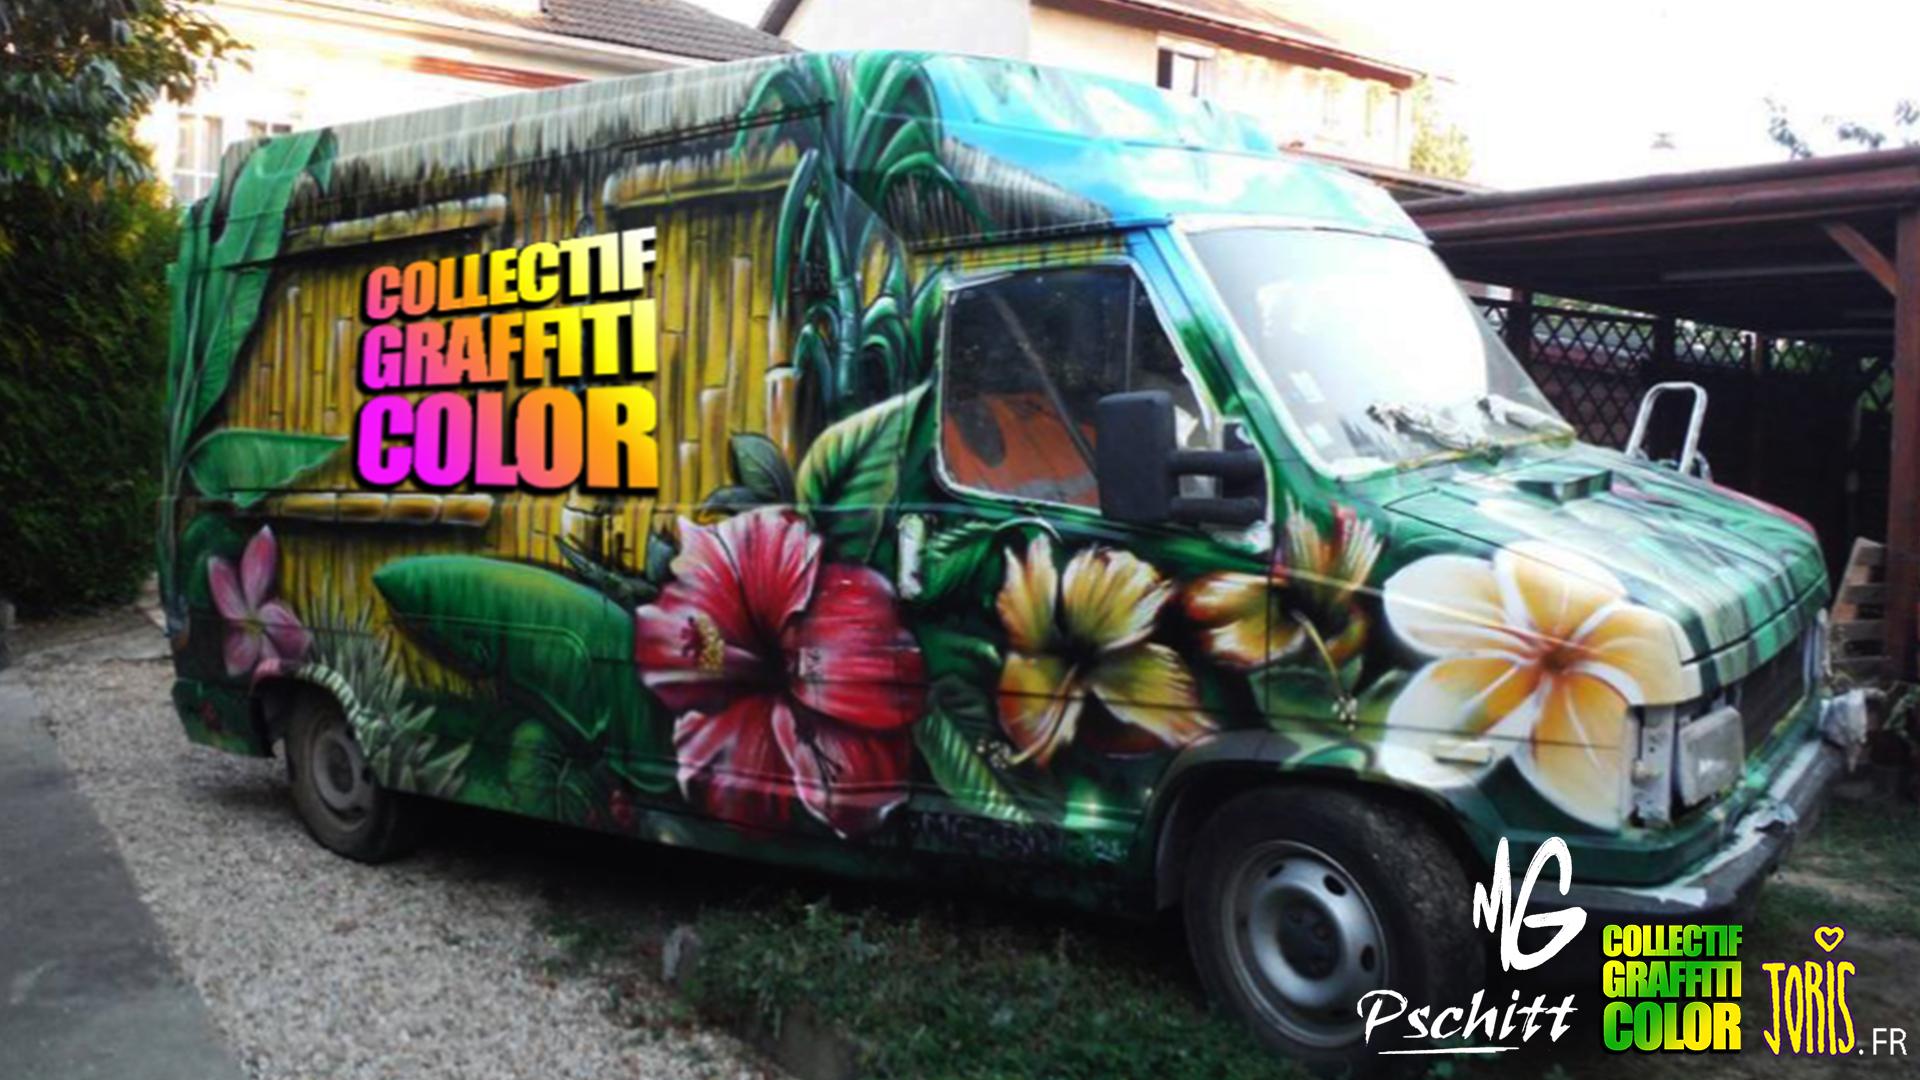 DECORATION-GRAFFITI-FRESQUE-TABLEAU-STREET-ART-PARIS-17